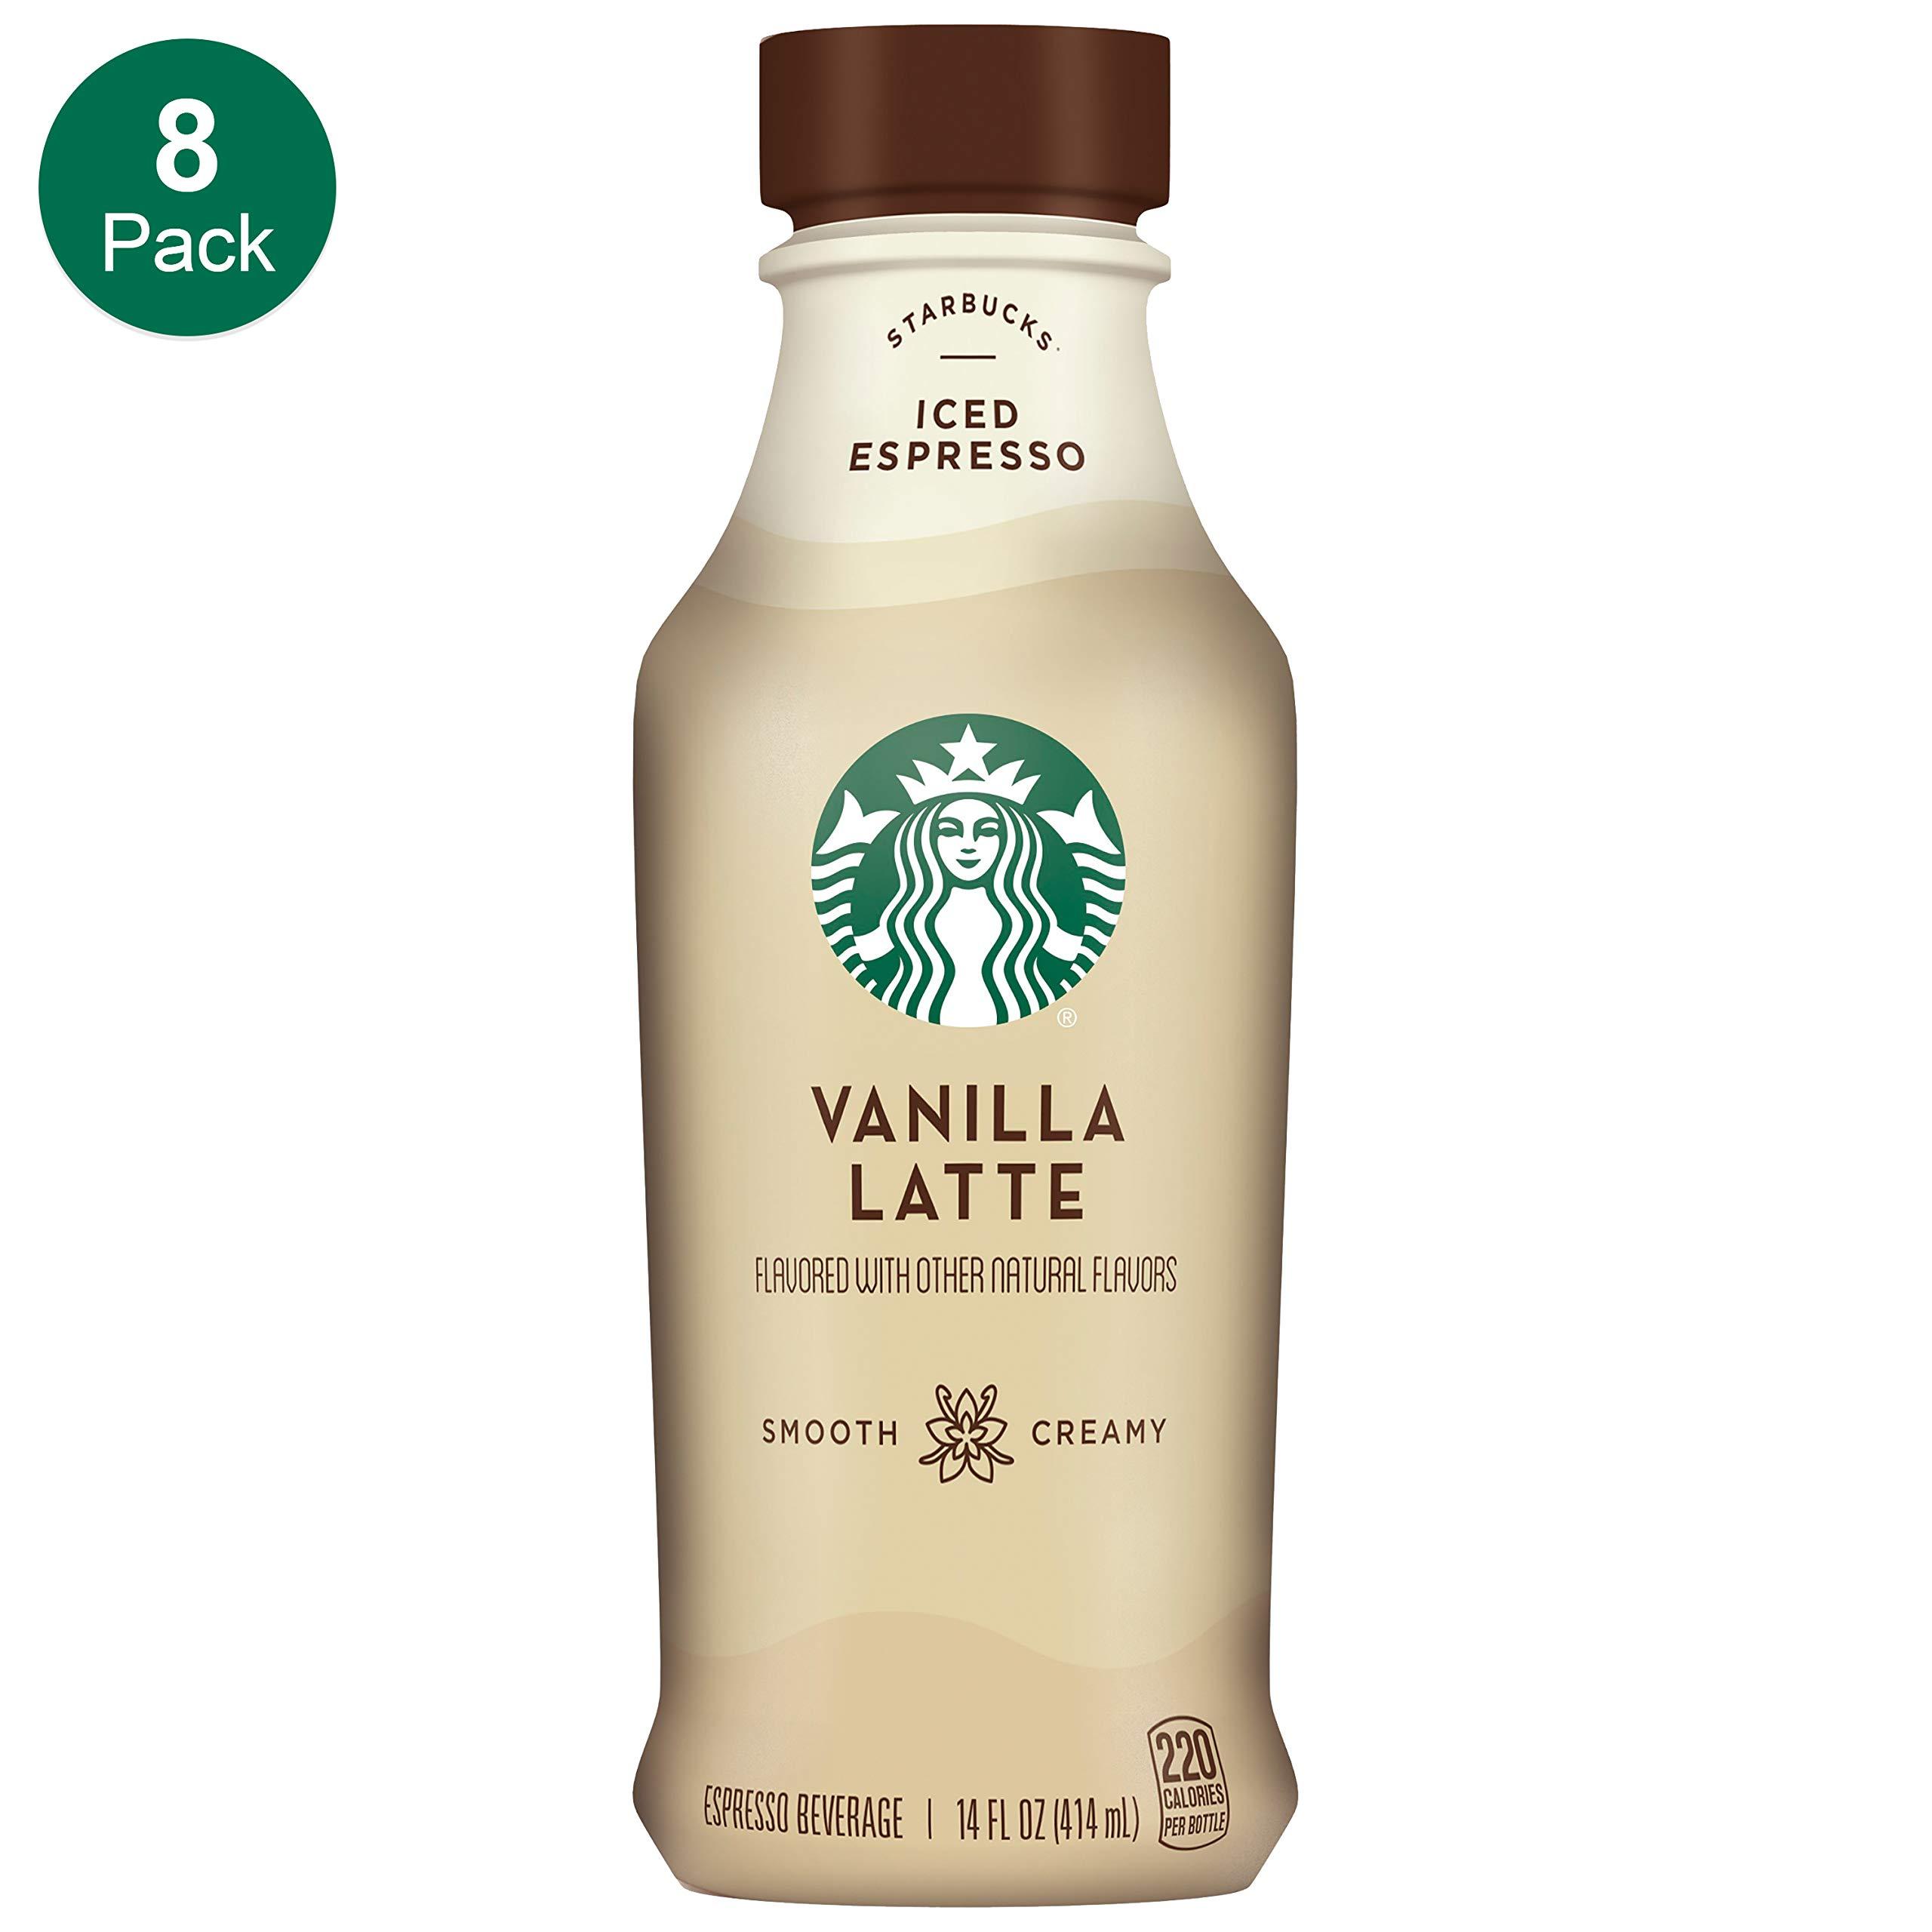 Starbucks Iced Latte, Vanilla, 14 Fl Oz (Pack of 8) by Starbucks